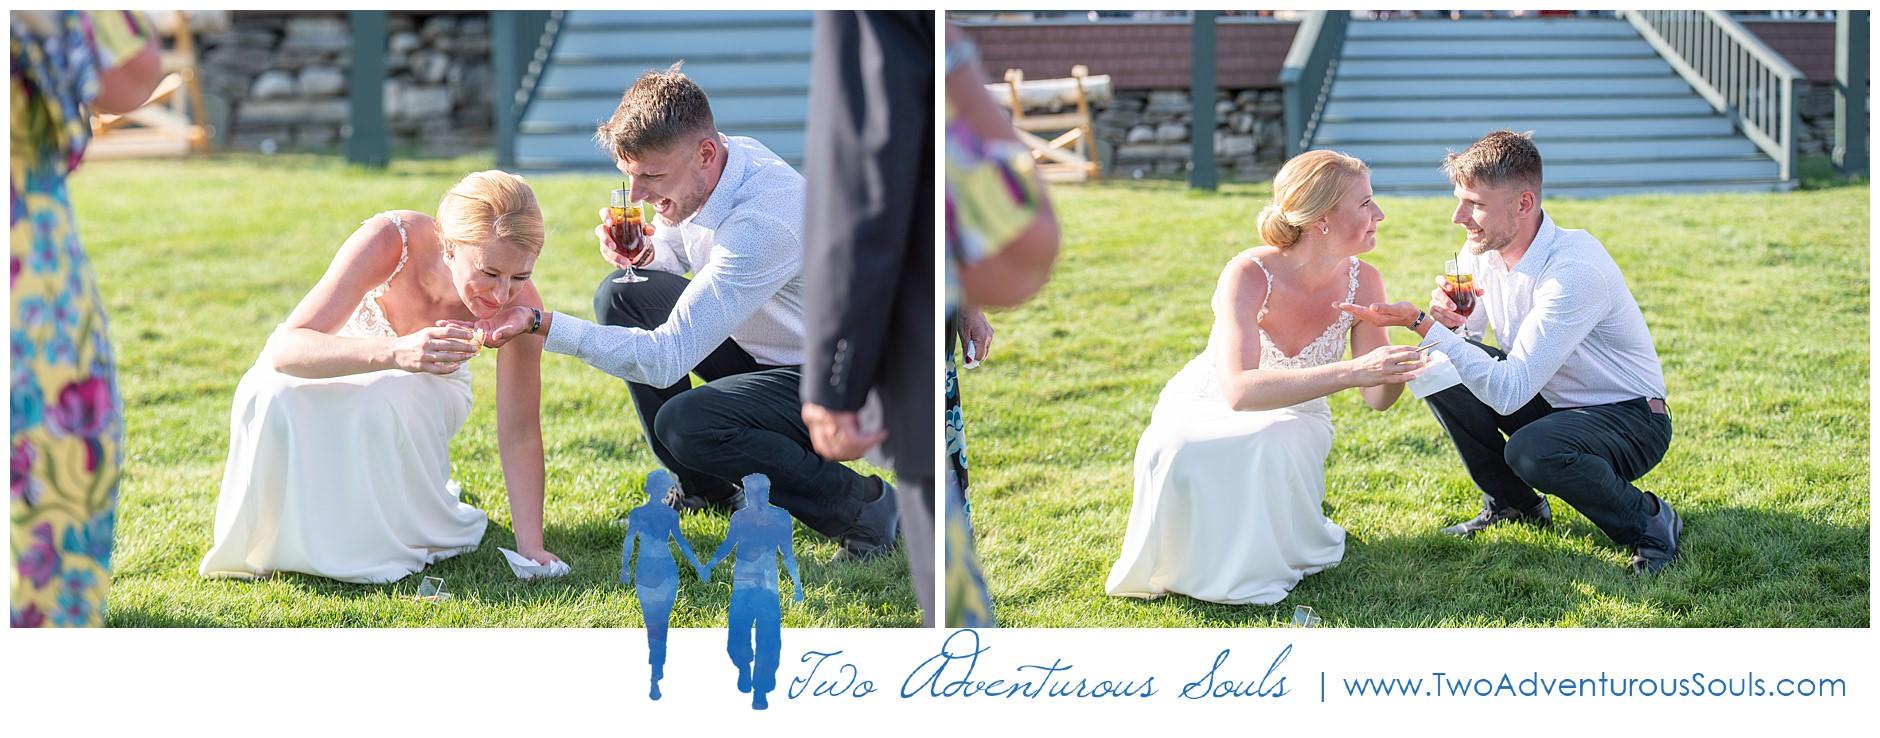 Maine Wedding Photographers, Point Lookout Wedding Photographers, Maine Elopement Photographers, Two Adventurous Souls-0080419_0051.jpg